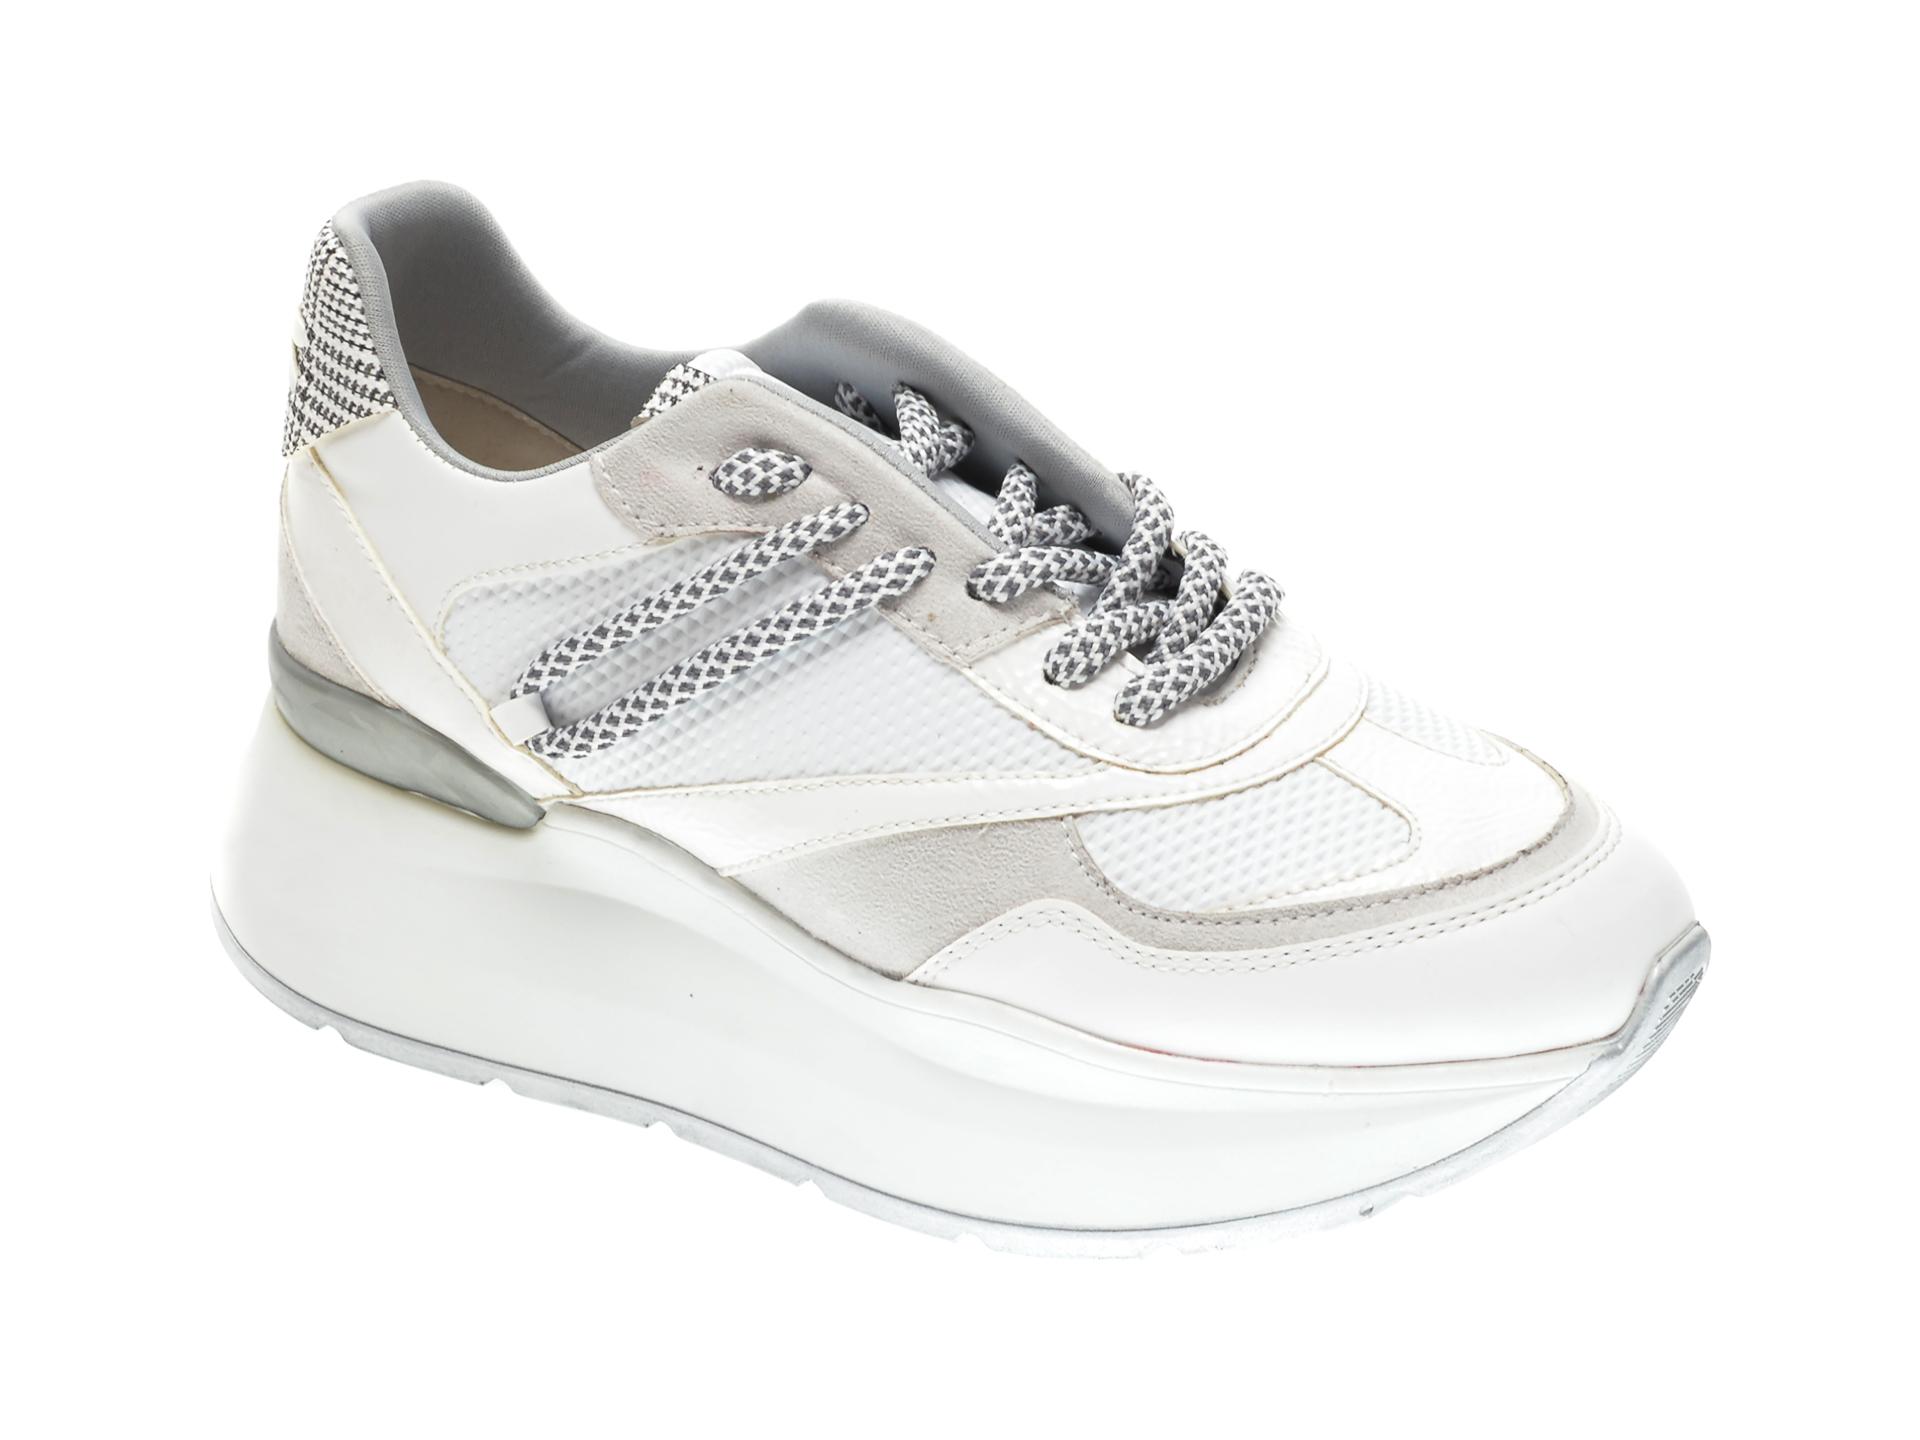 Pantofi sport RADIKAL albi, 2794, din piele ecologica si material textil imagine